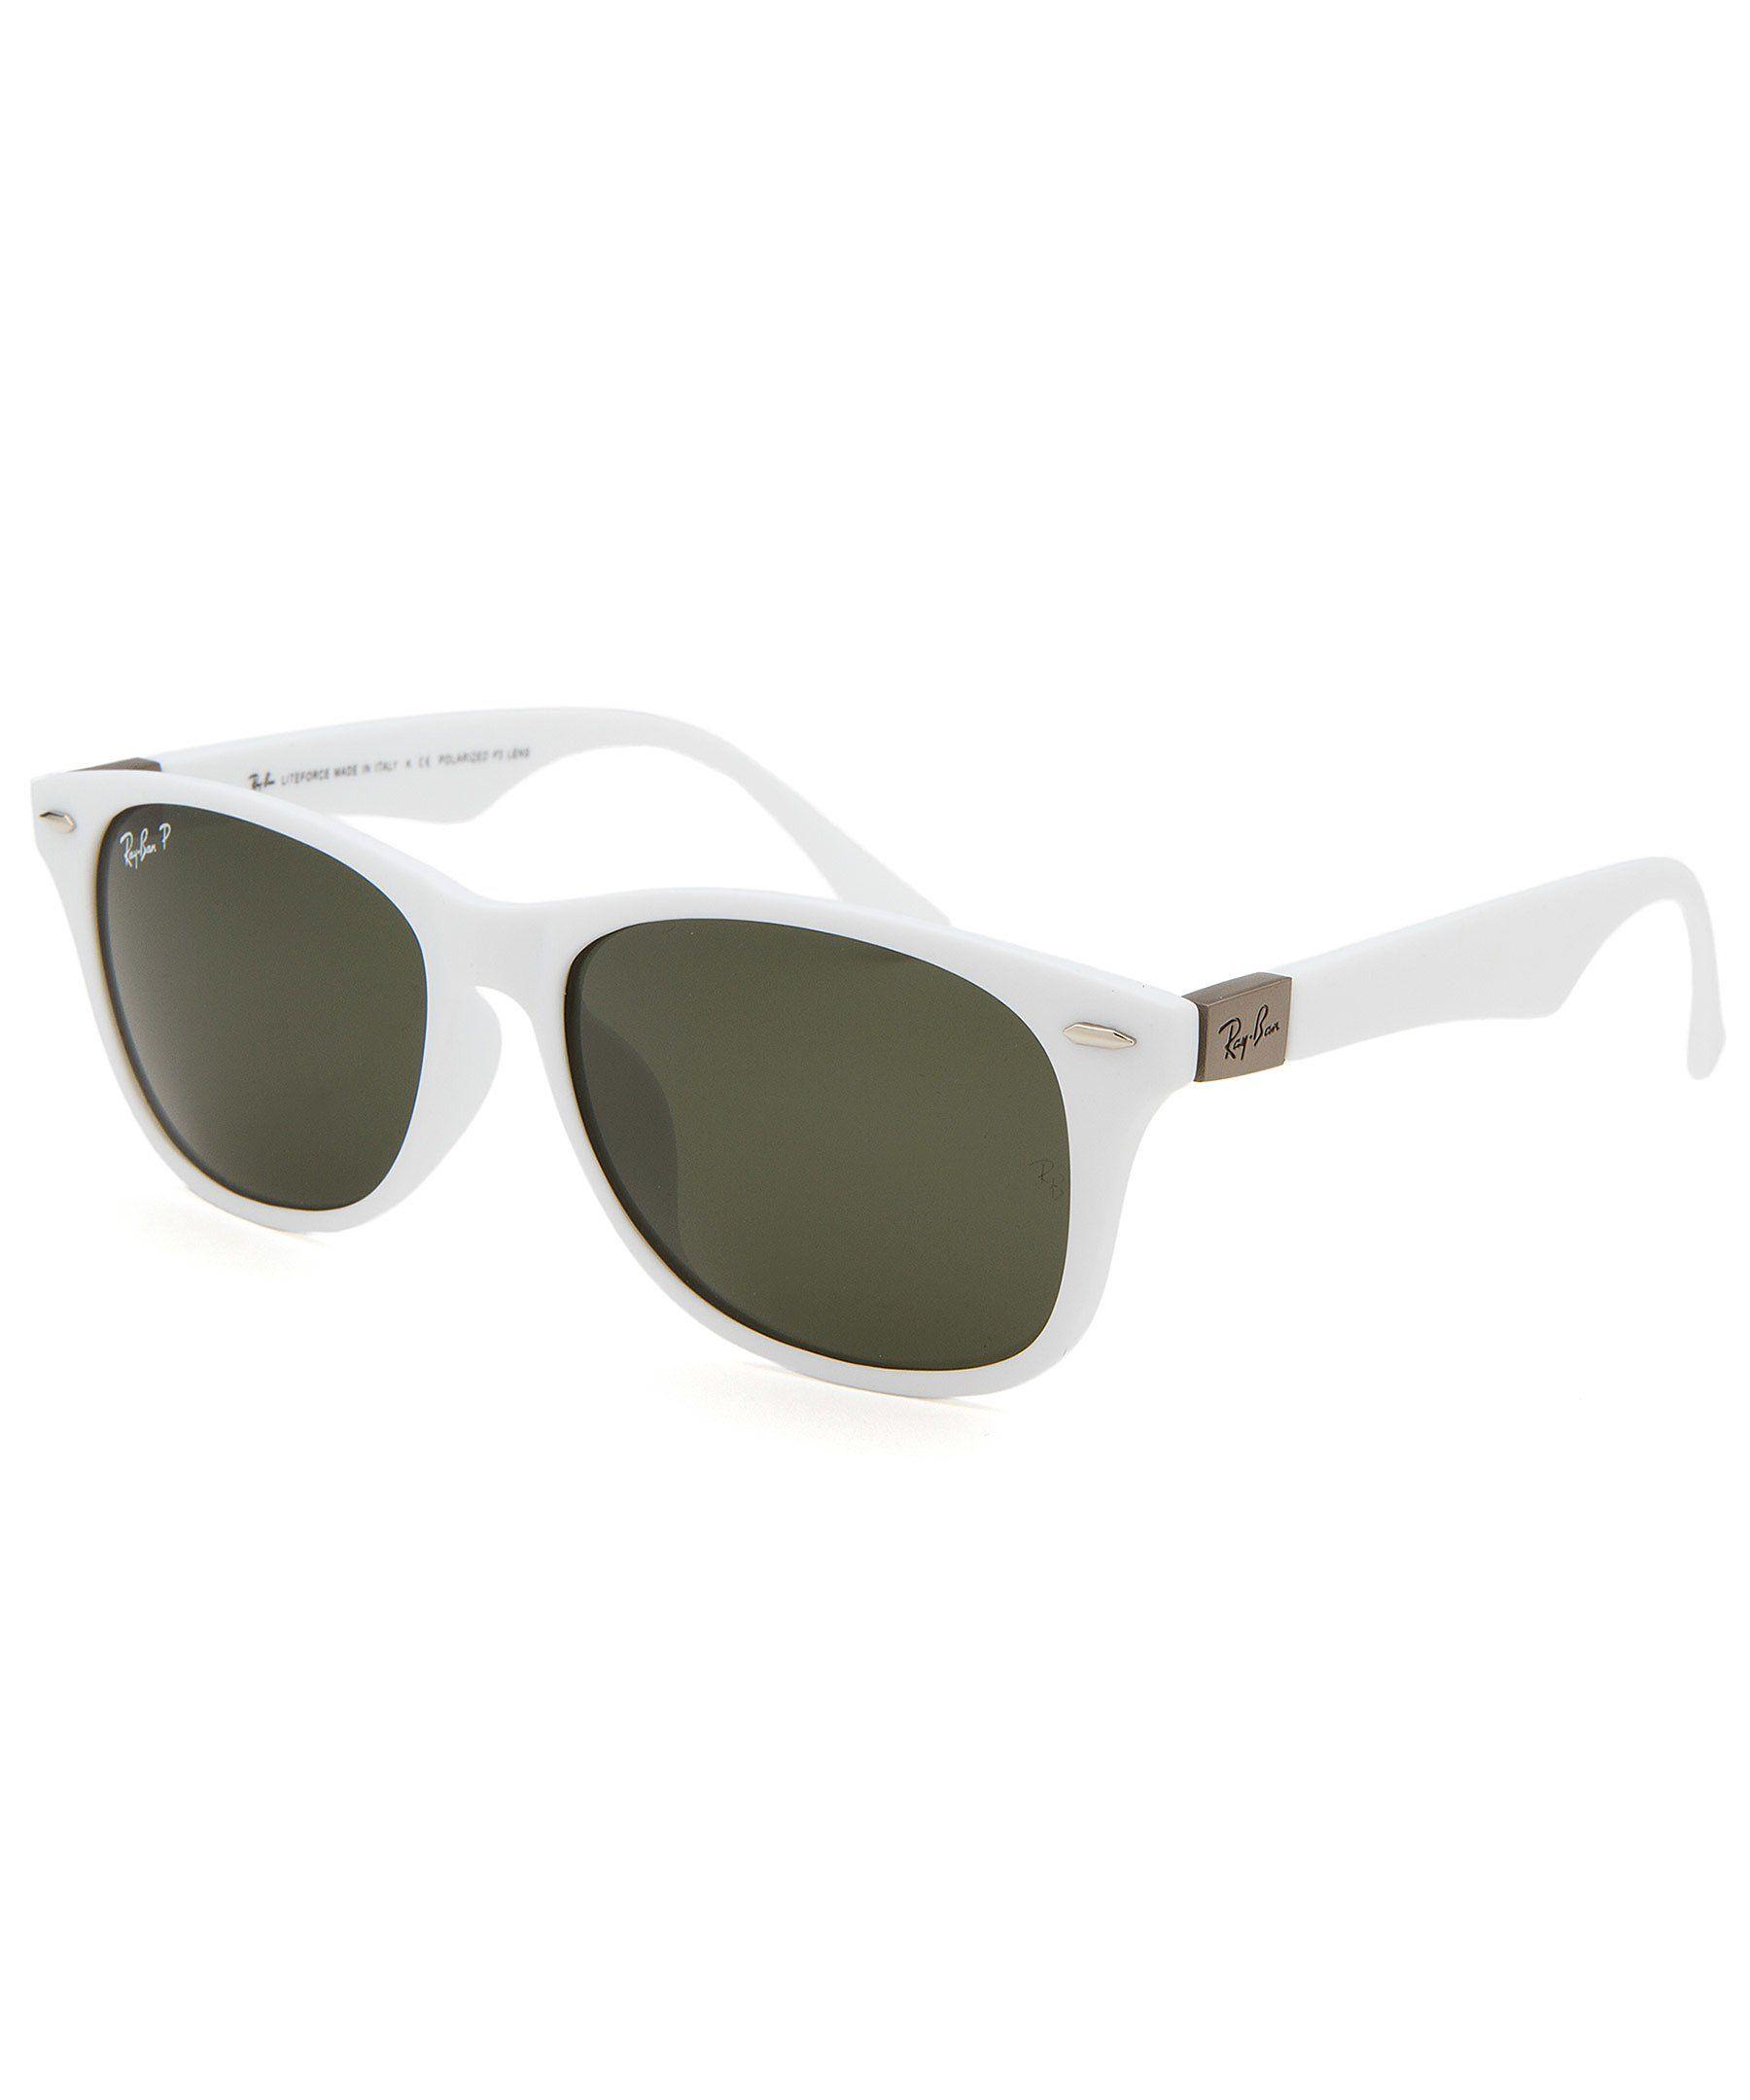 47204a7f7a4 Ray-Ban New Wayfarer Liteforce White Sunglasses